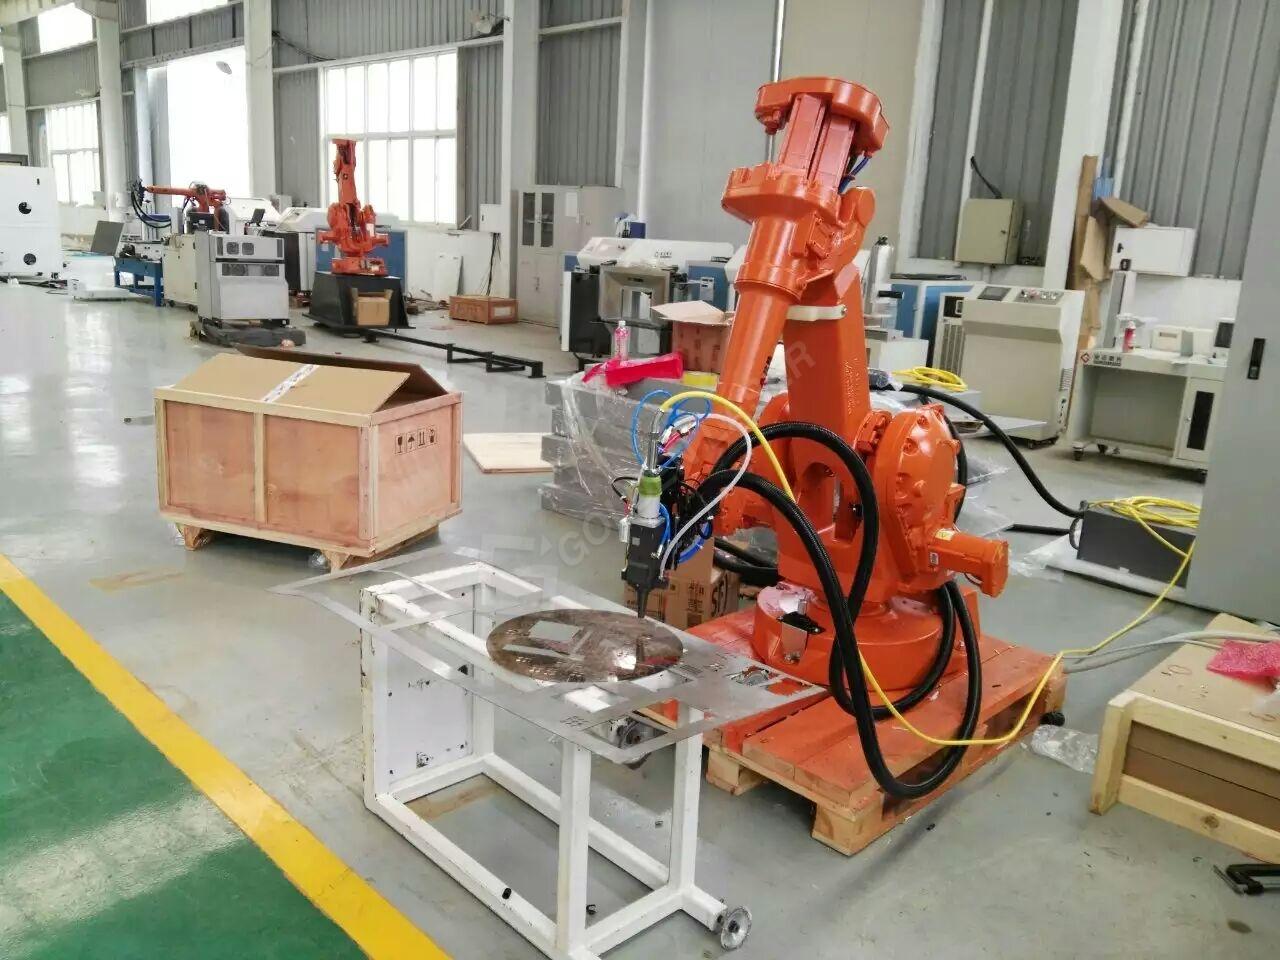 PriceList for 2mm Steel Laser Cutting Machine - Fiber Laser Robot Arm 3D Cutting Tube / Pipe – Vtop Fiber Laser